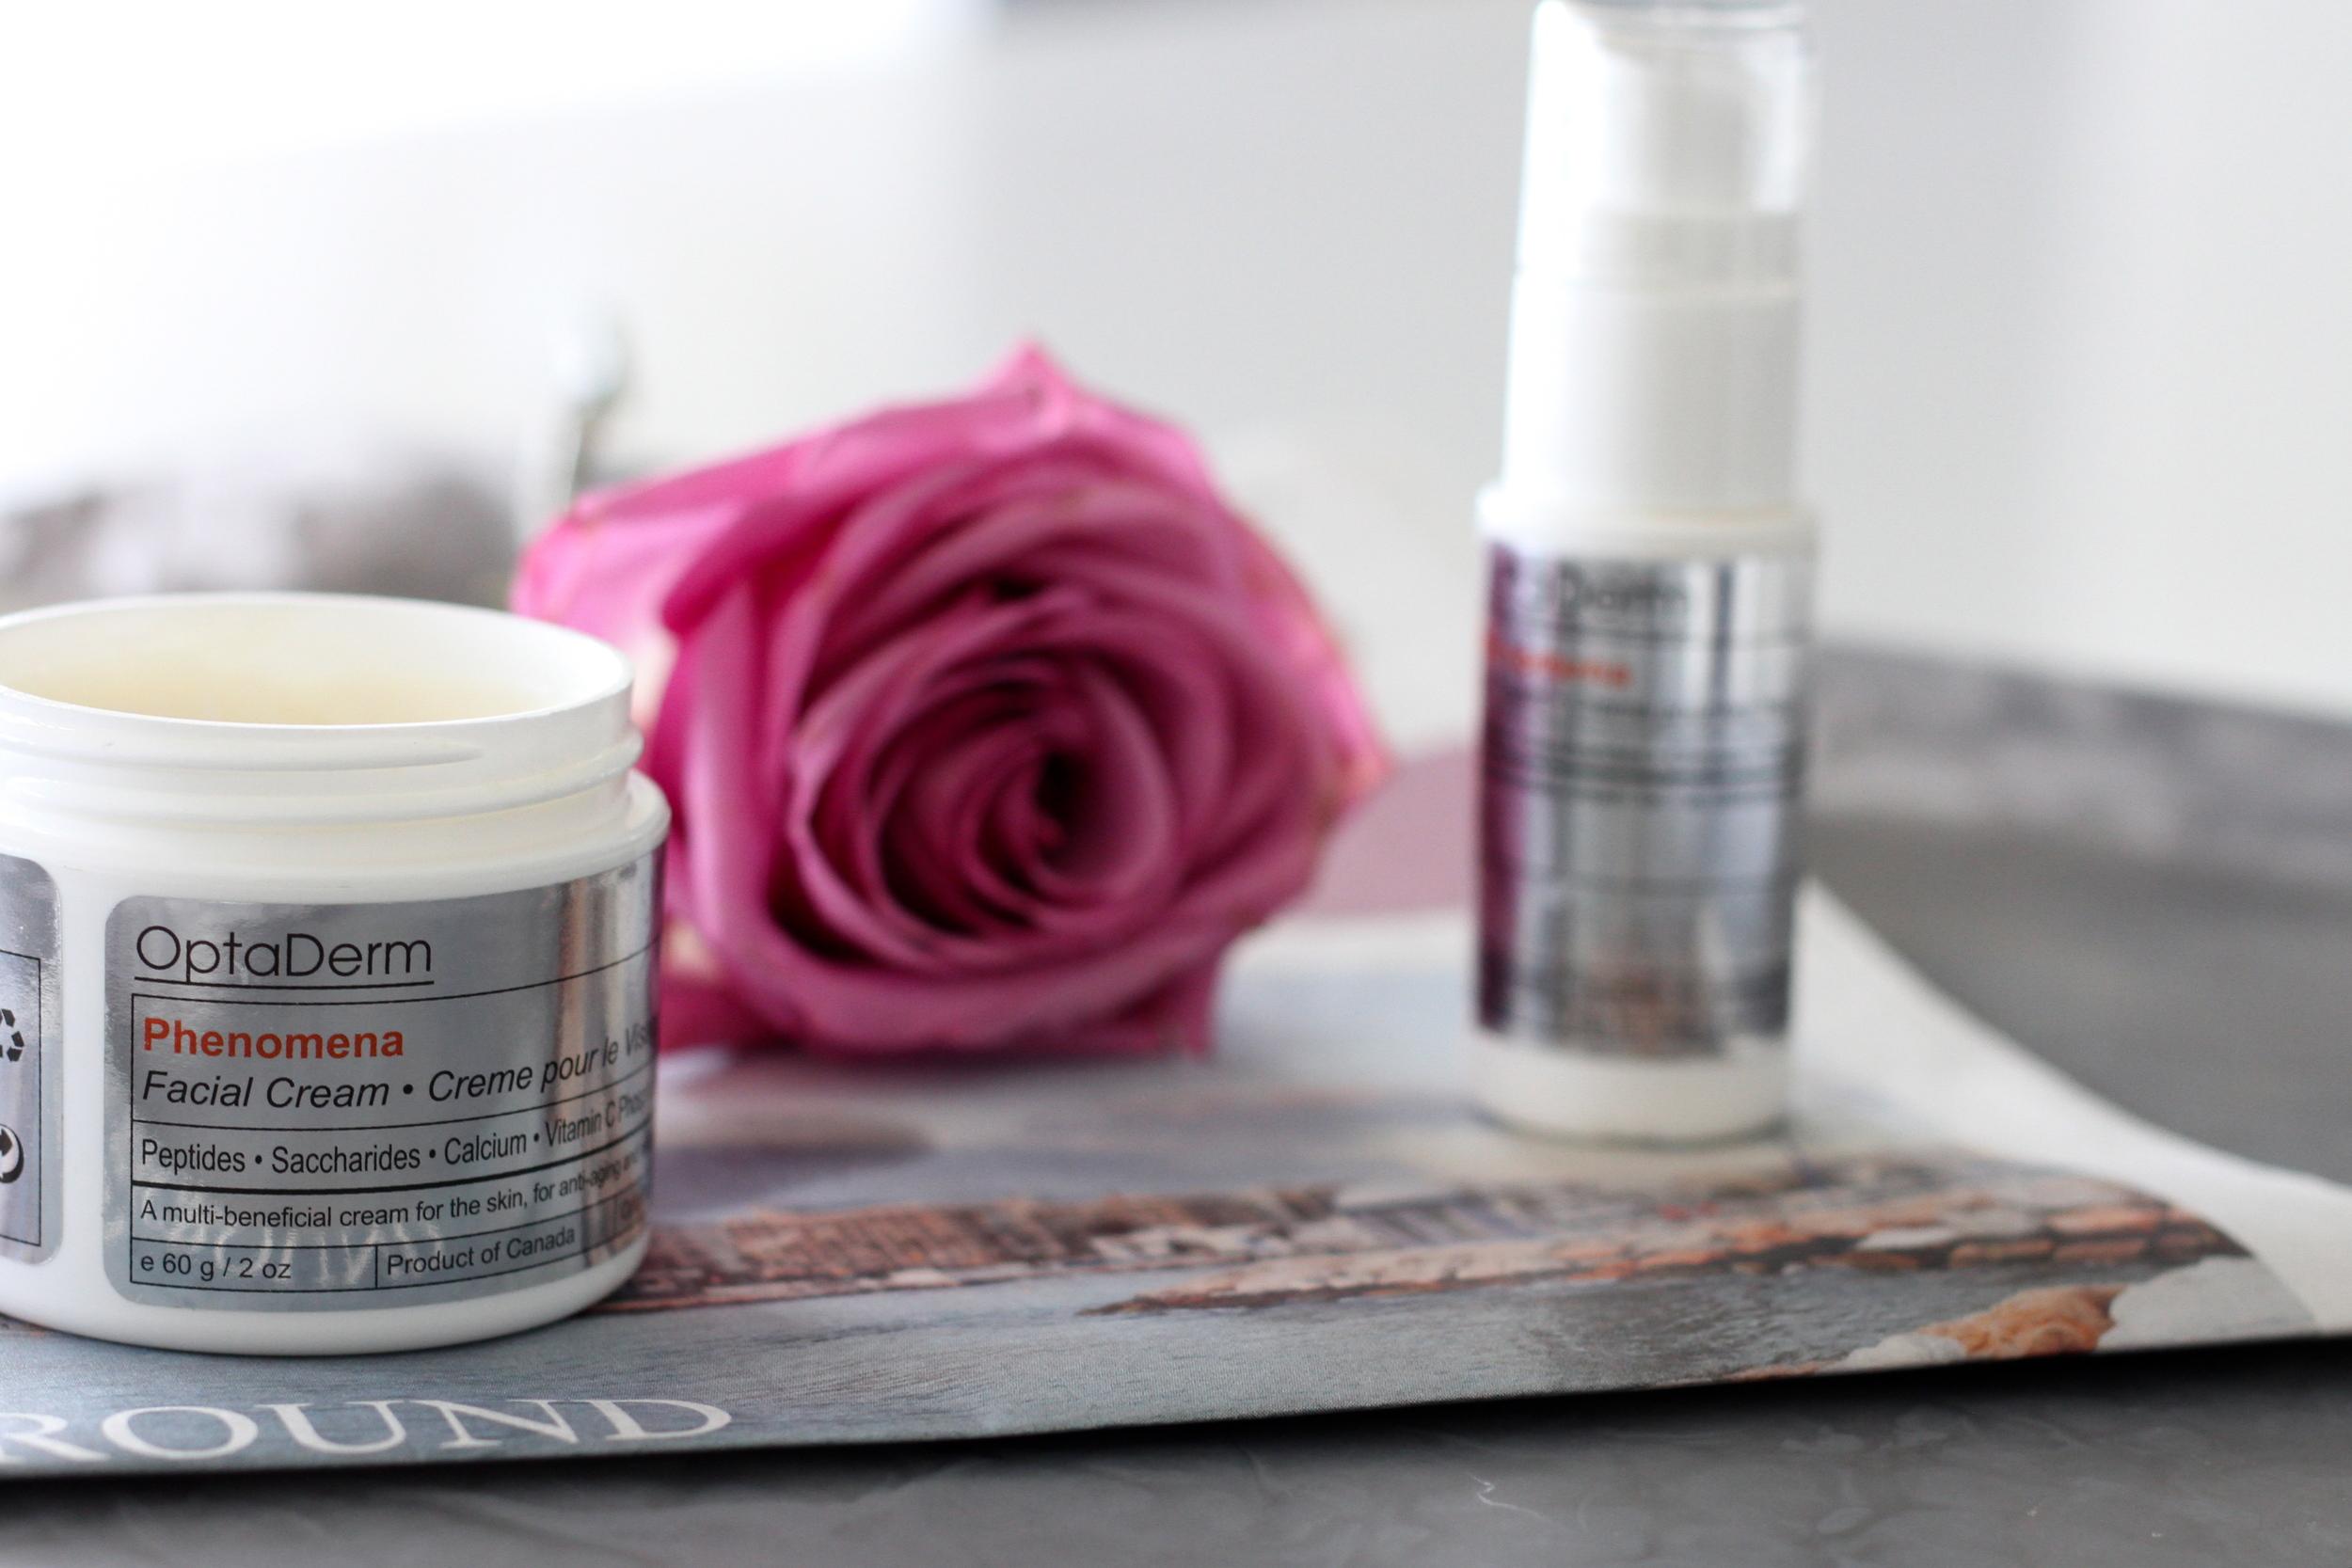 Optaderm Skincare Phenomena Facial Cream.